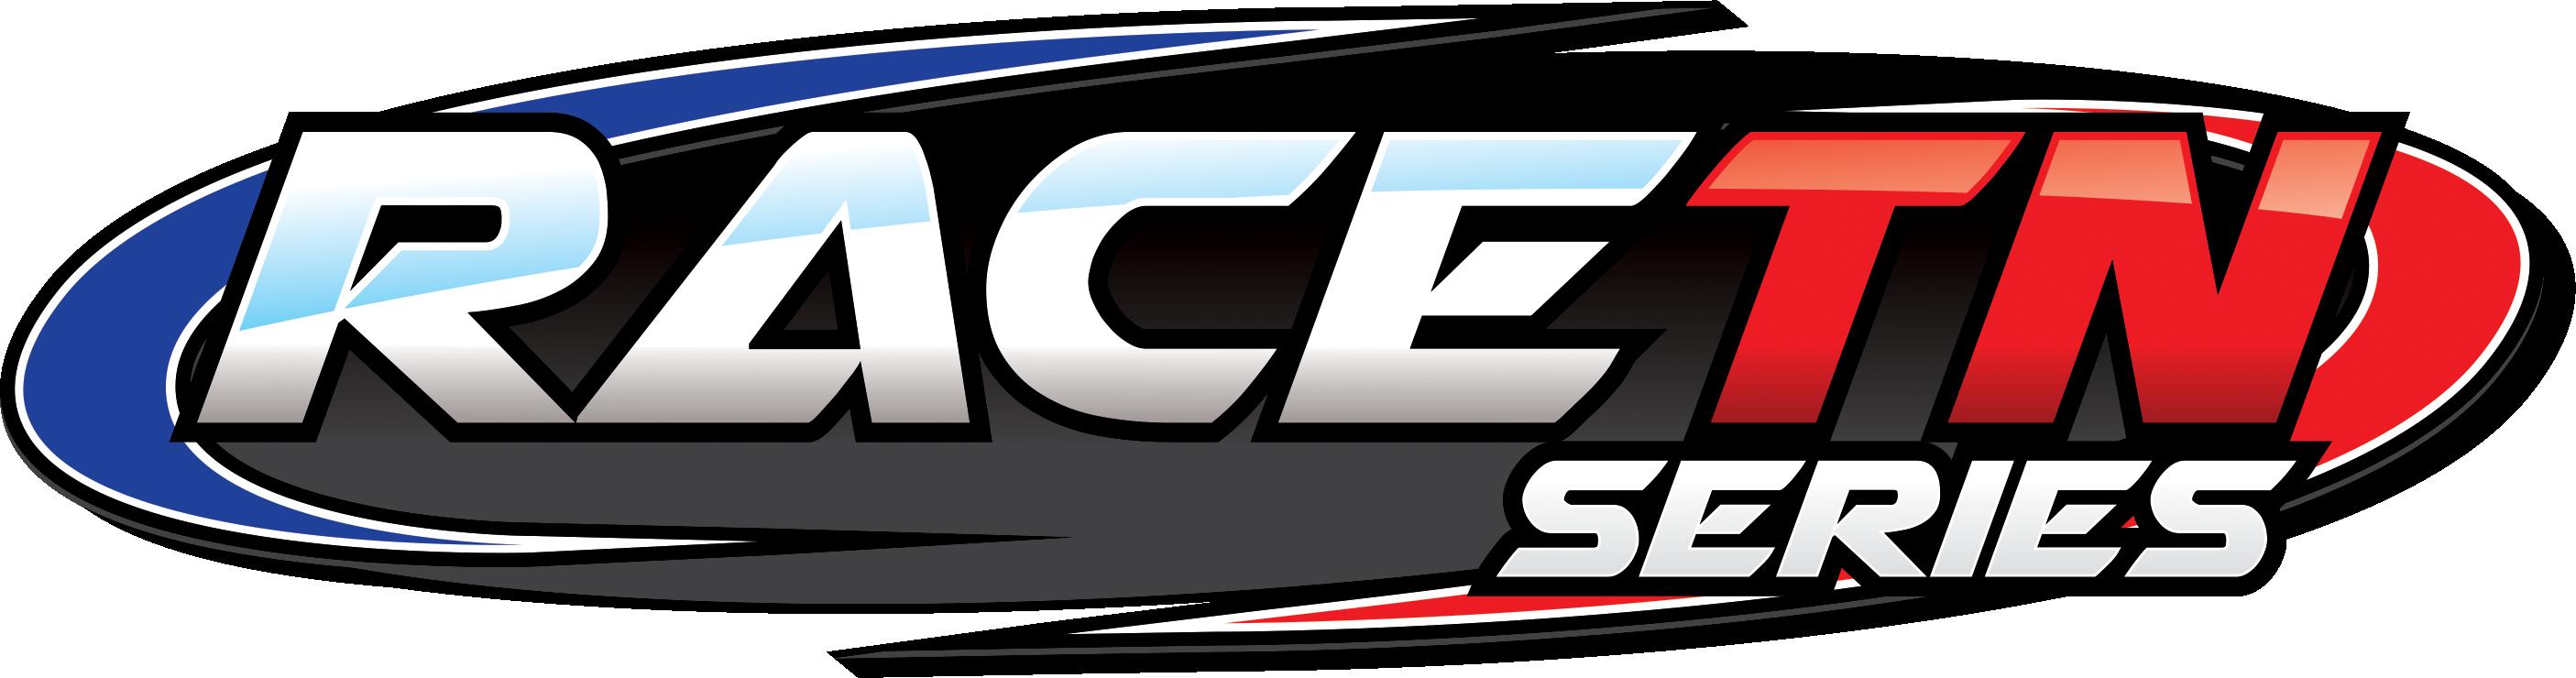 Race car track clipart clip transparent download Home - Race Tennessee LLC|Race TN Series clip transparent download